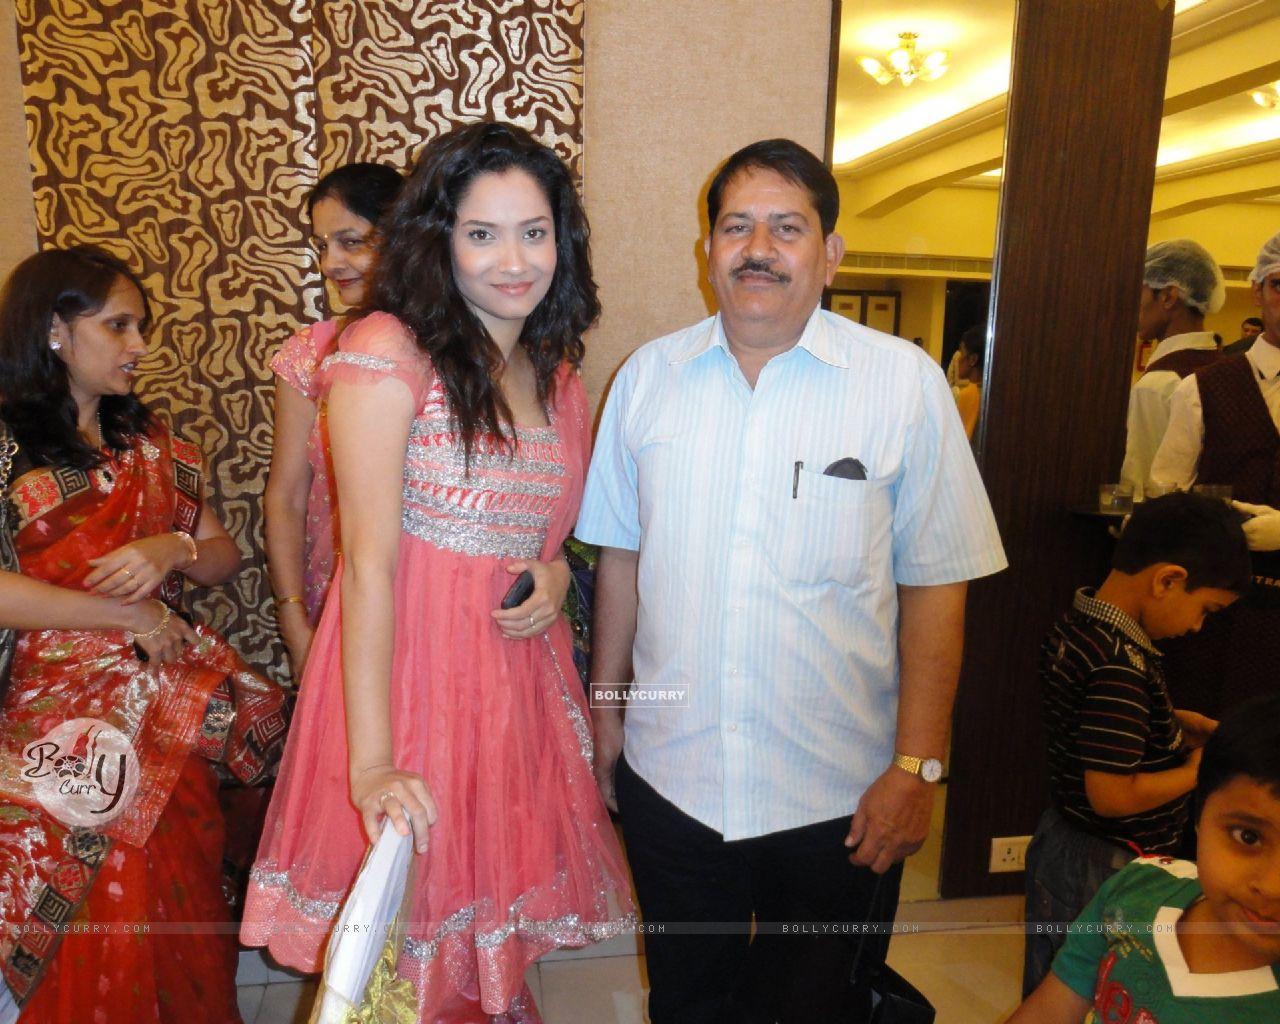 Ankita Sharma And Her Husband | www.imgkid.com - The Image ...